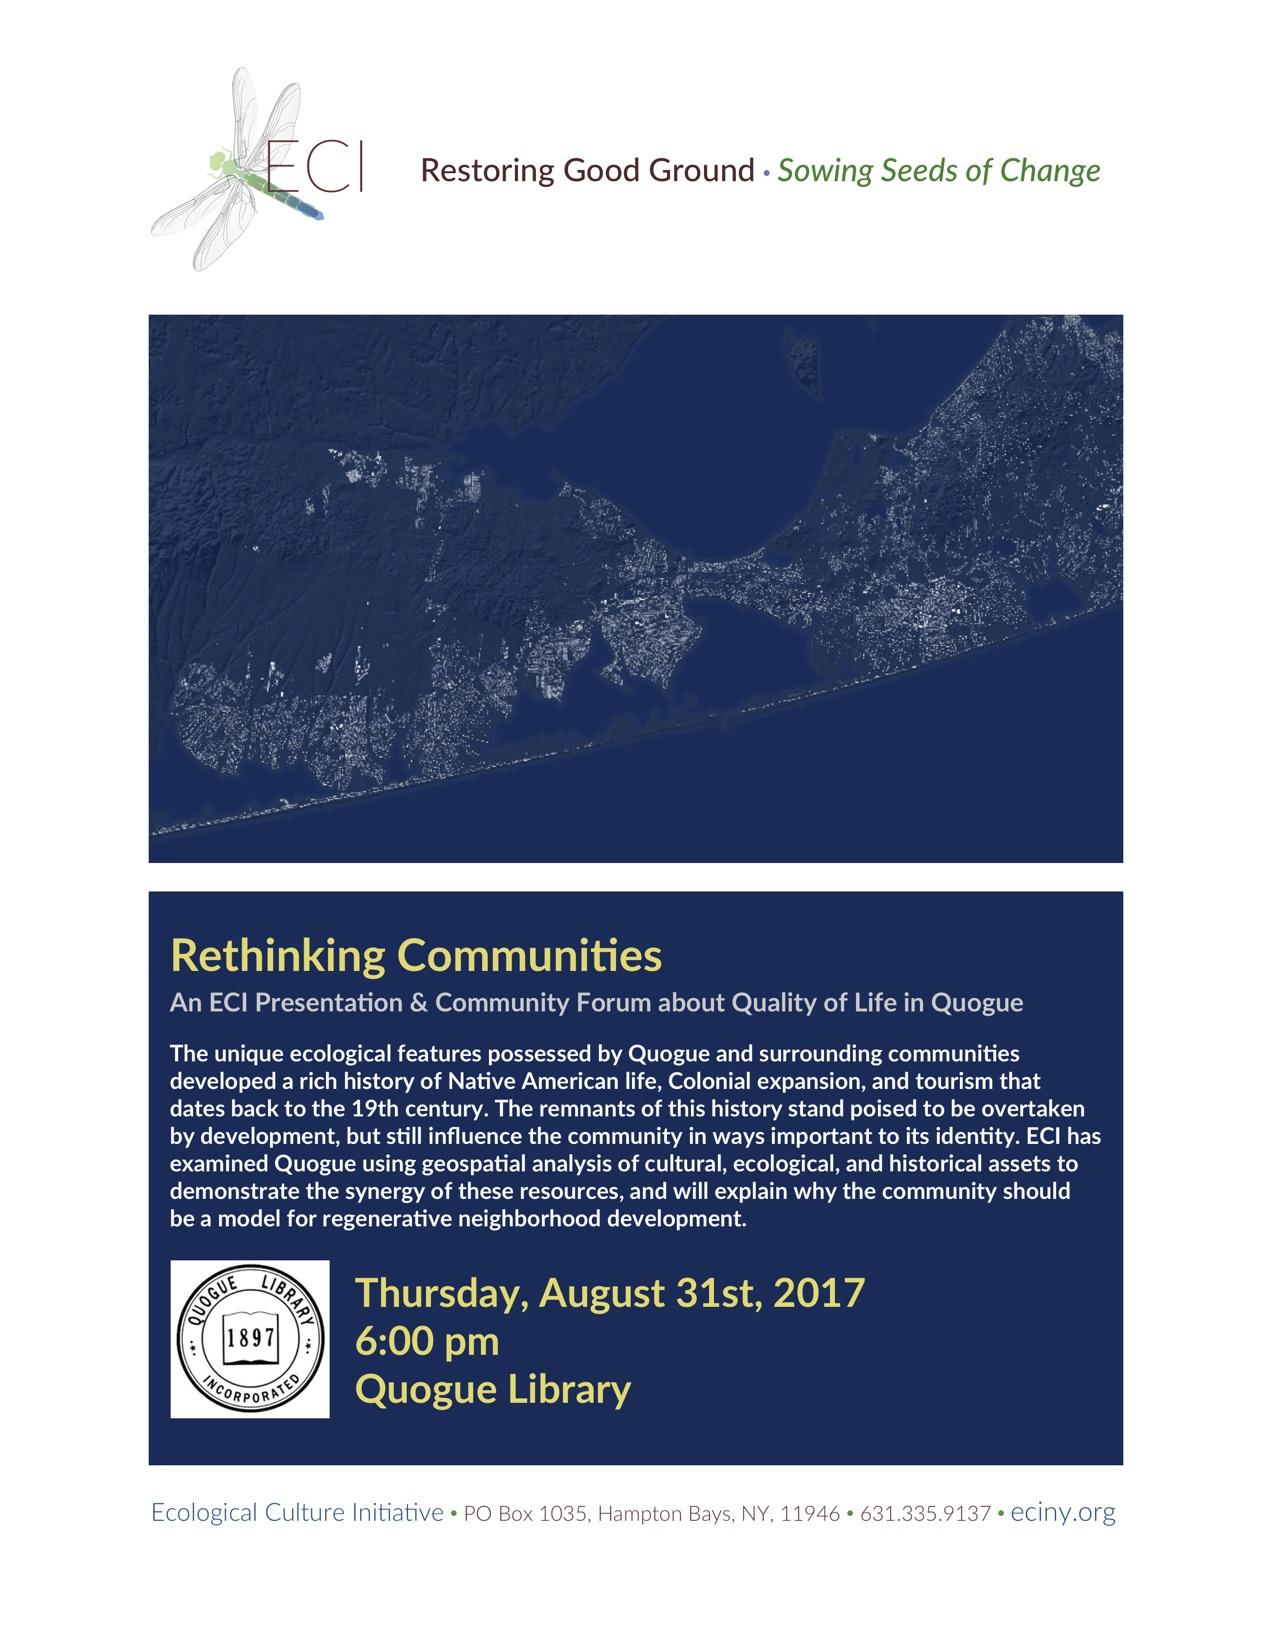 Rethinking Communities - Aug 31st, 2017 - 8.5x11 flyer.jpg